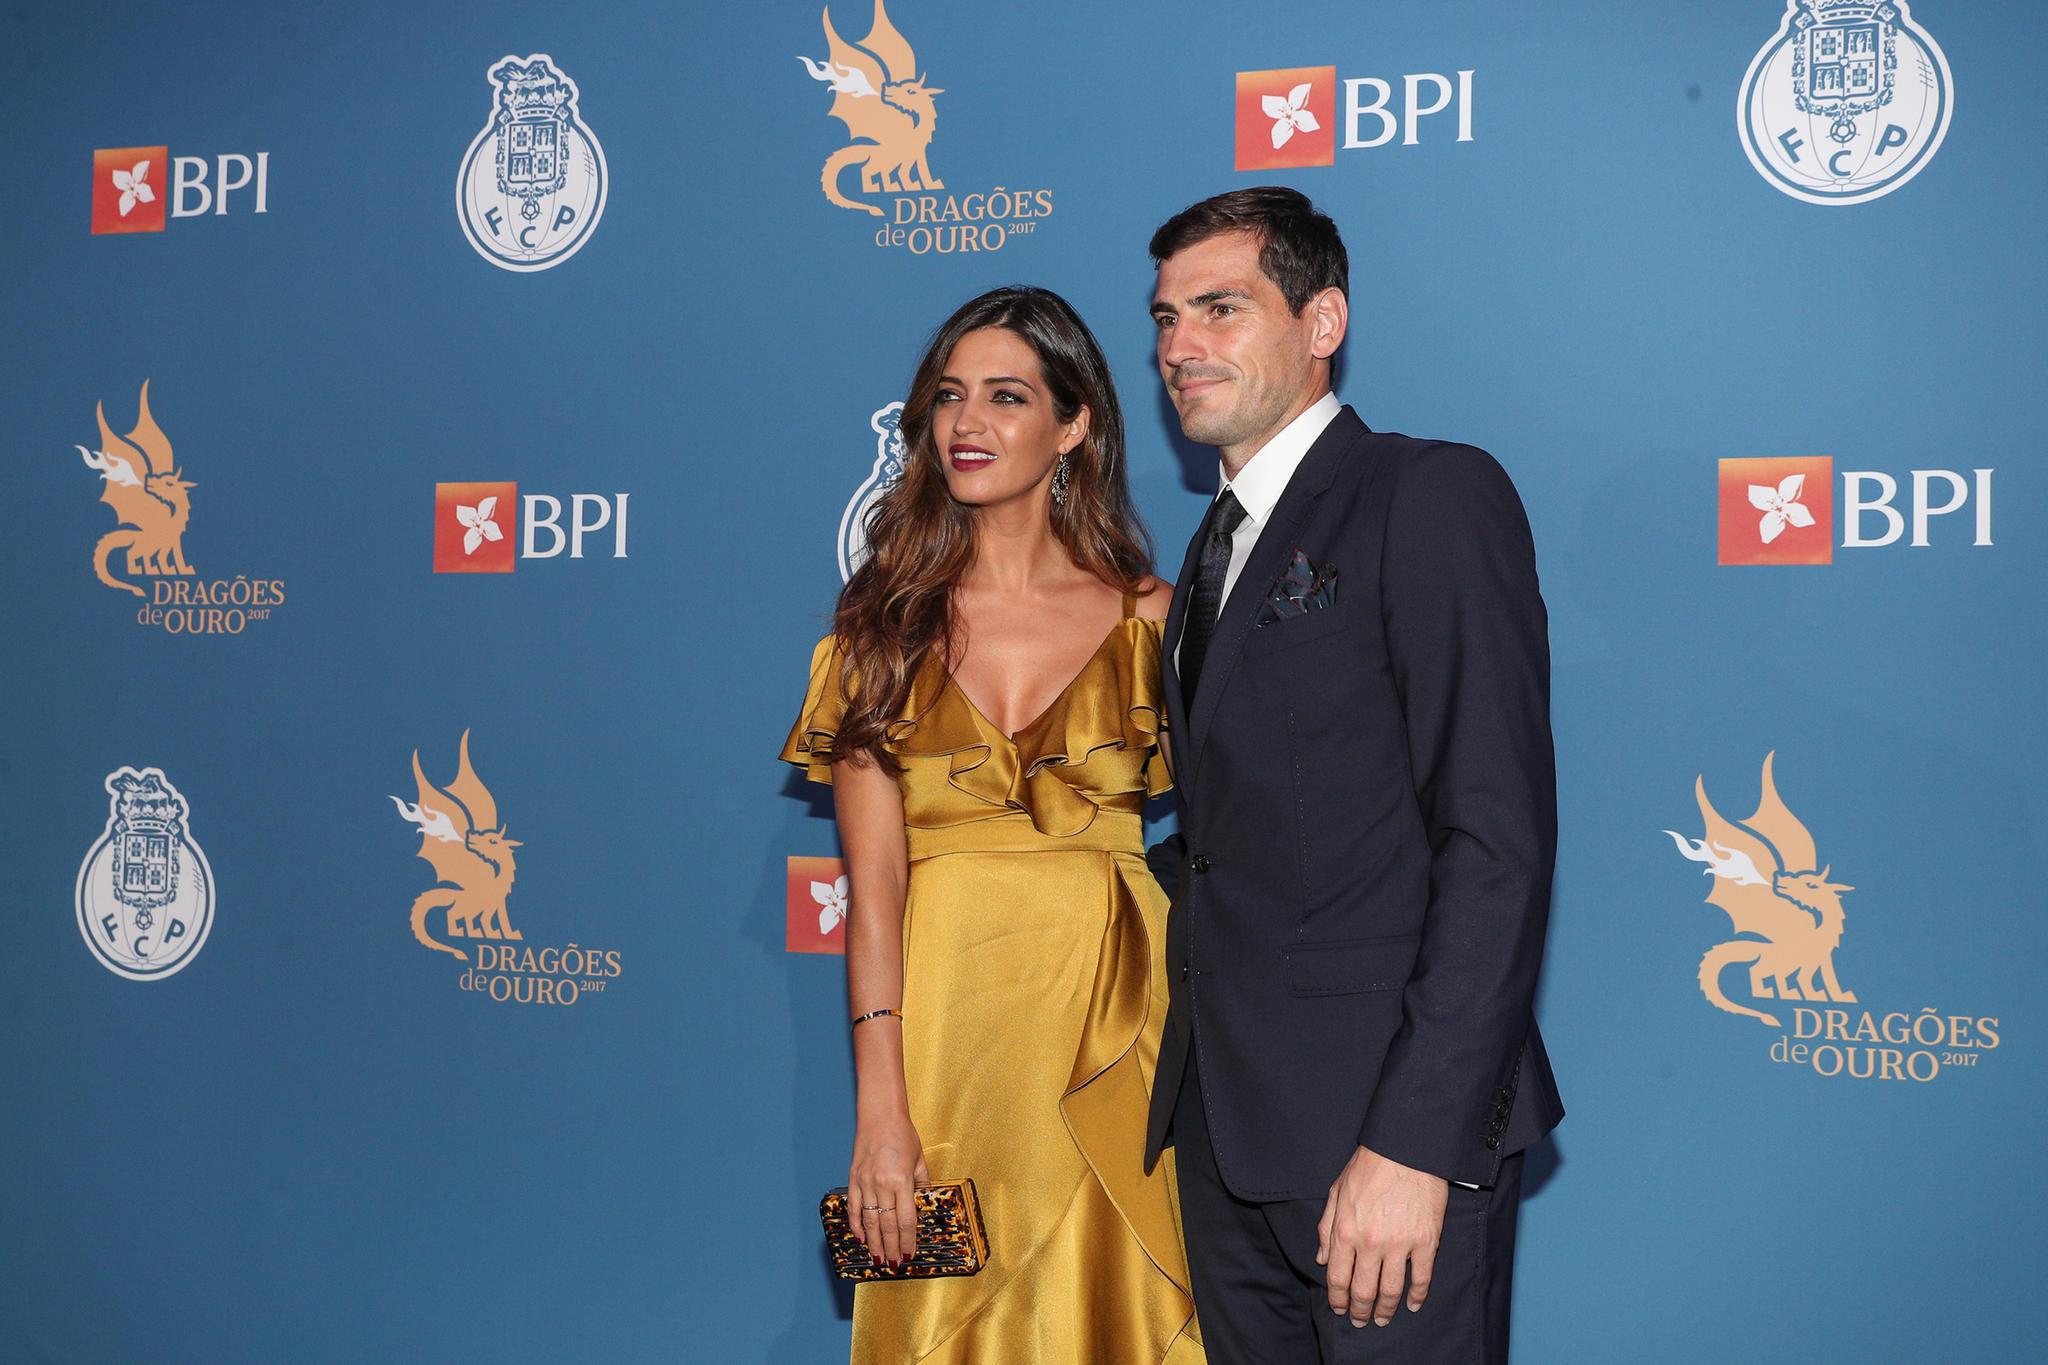 Casillas: Herzinfarkt folgte Krebsdiagnose bei seiner Frau